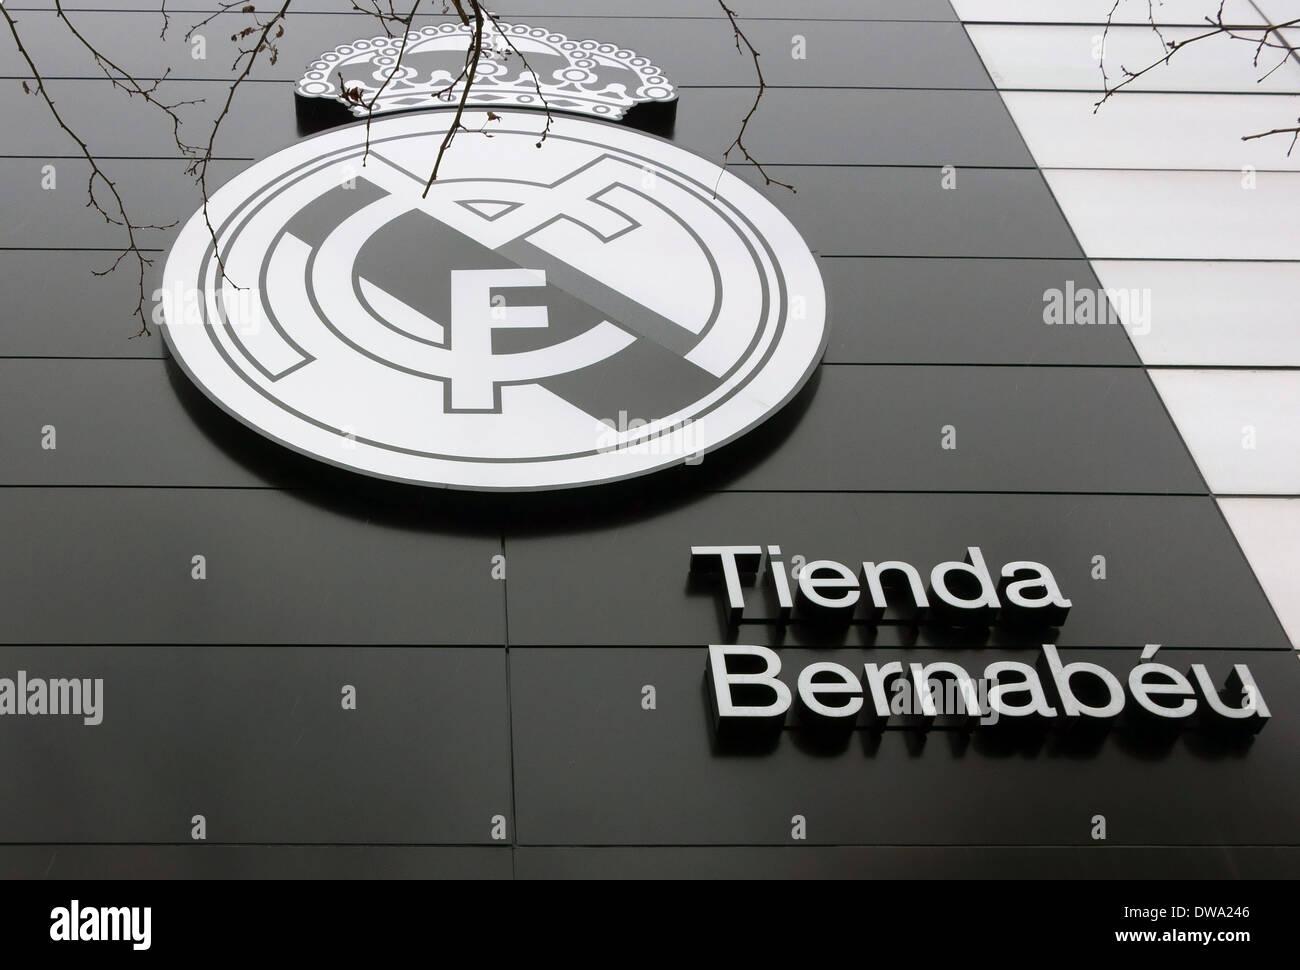 Real Madrid Imágenes De Stock   Real Madrid Fotos De Stock - Alamy f1291482a1477